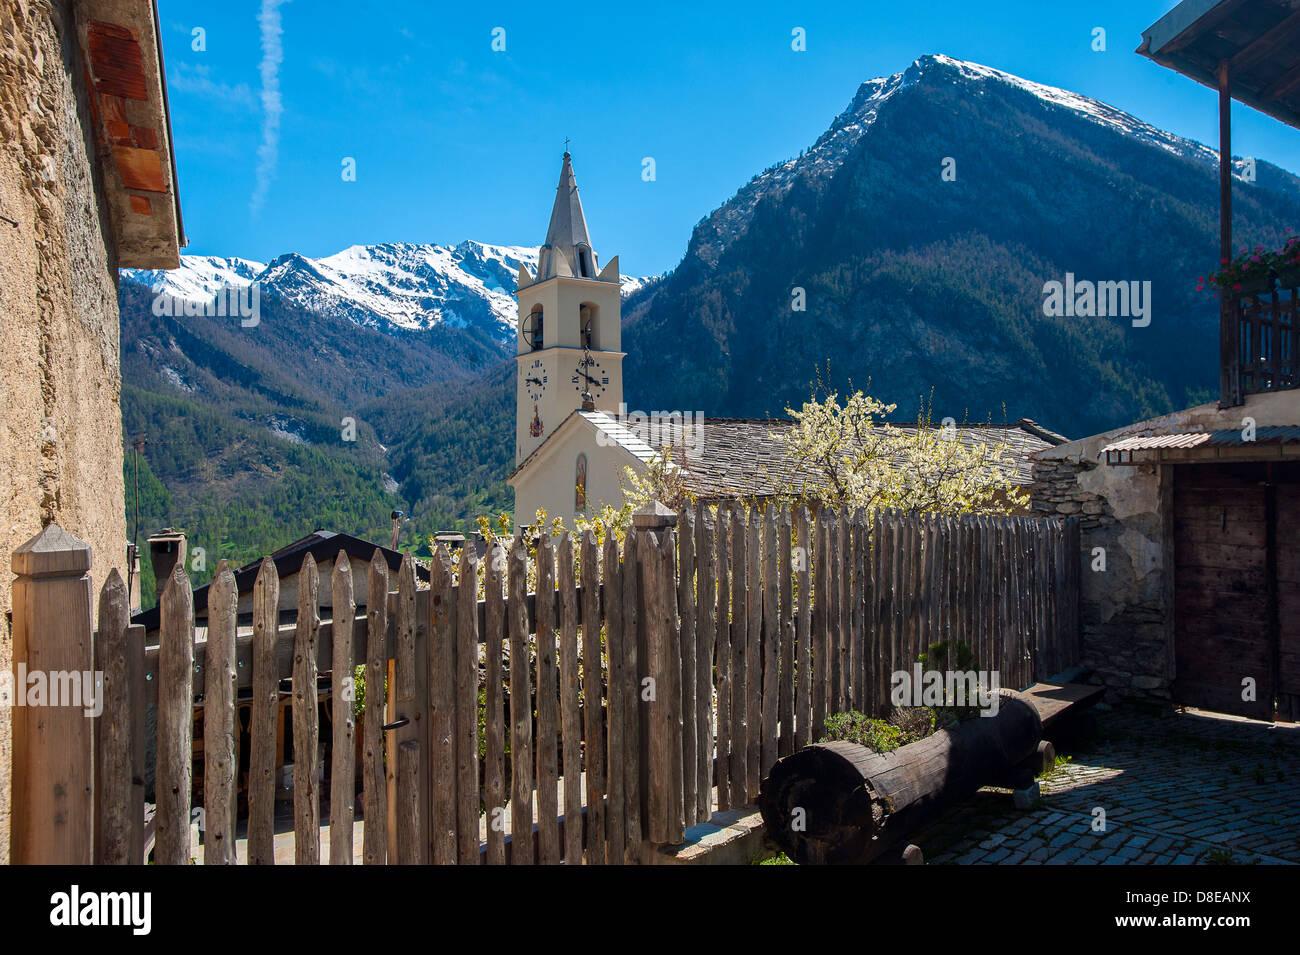 Europe Italy Province of Torino Piedmont Orsiera Rocciavriè Park Usseaux  the Church s. Pietro Apostolo - Stock Image